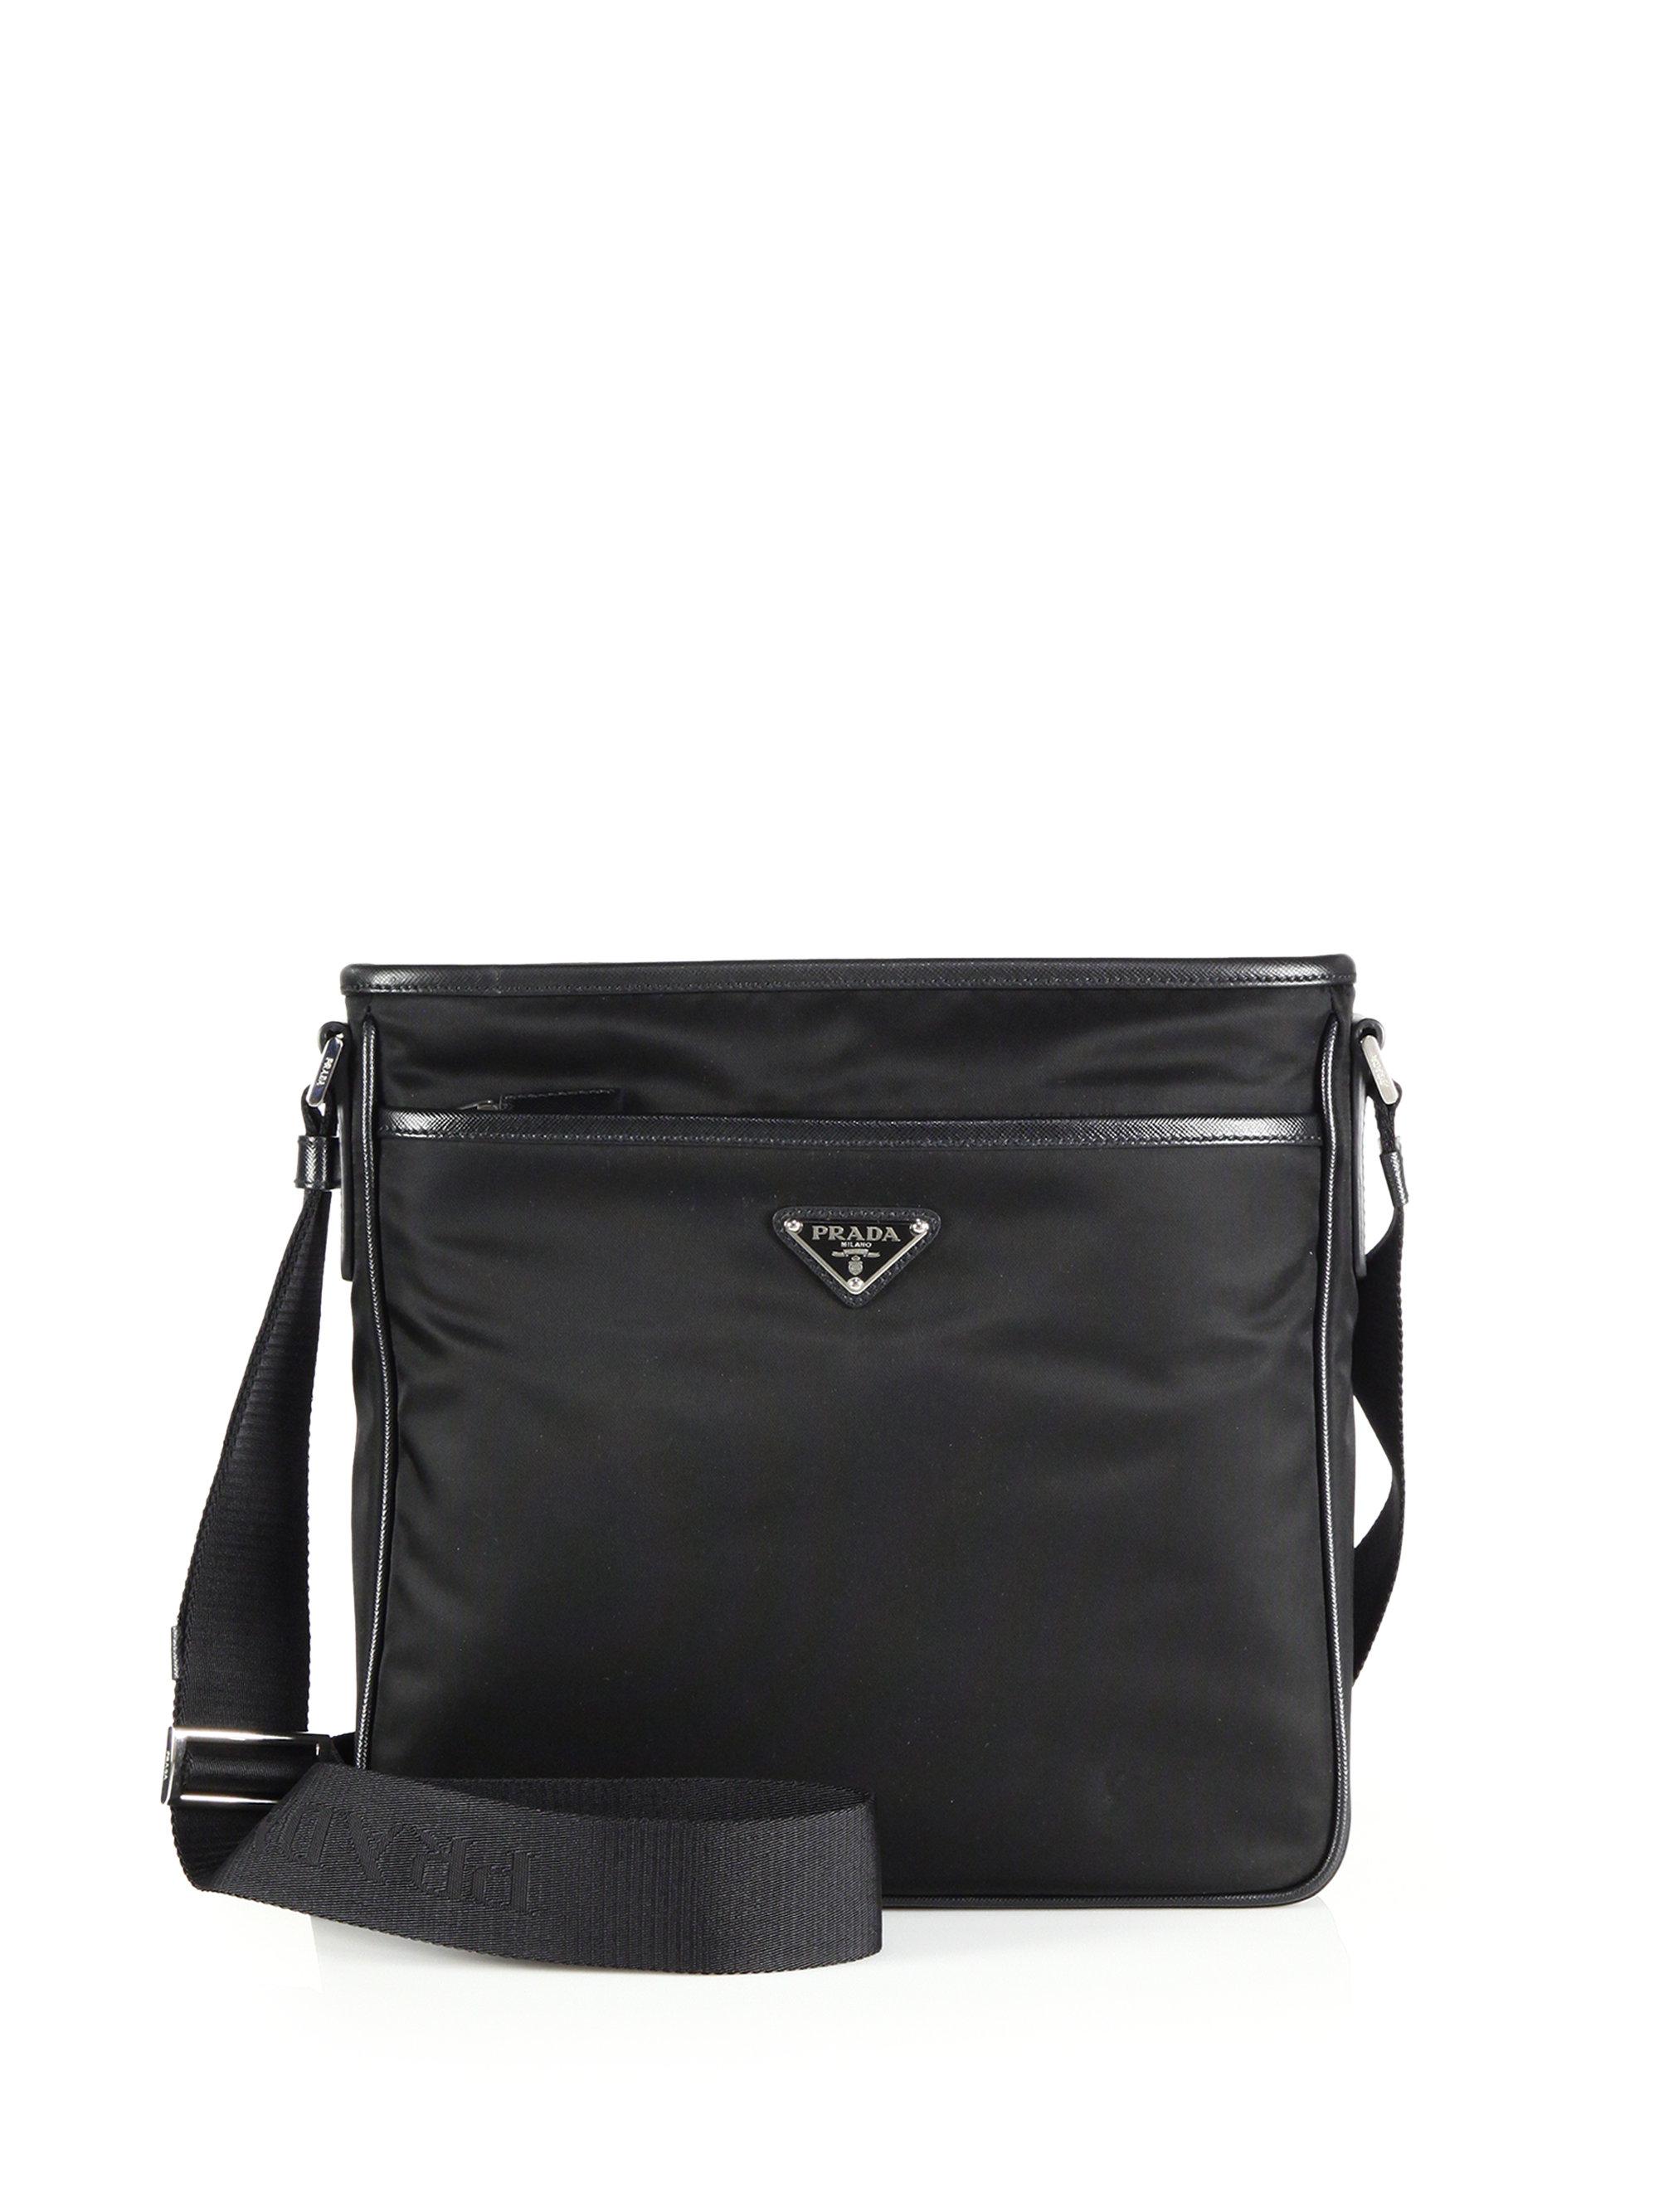 8f086262df Lyst - Prada Nylon Crossbody Bag in Black for Men